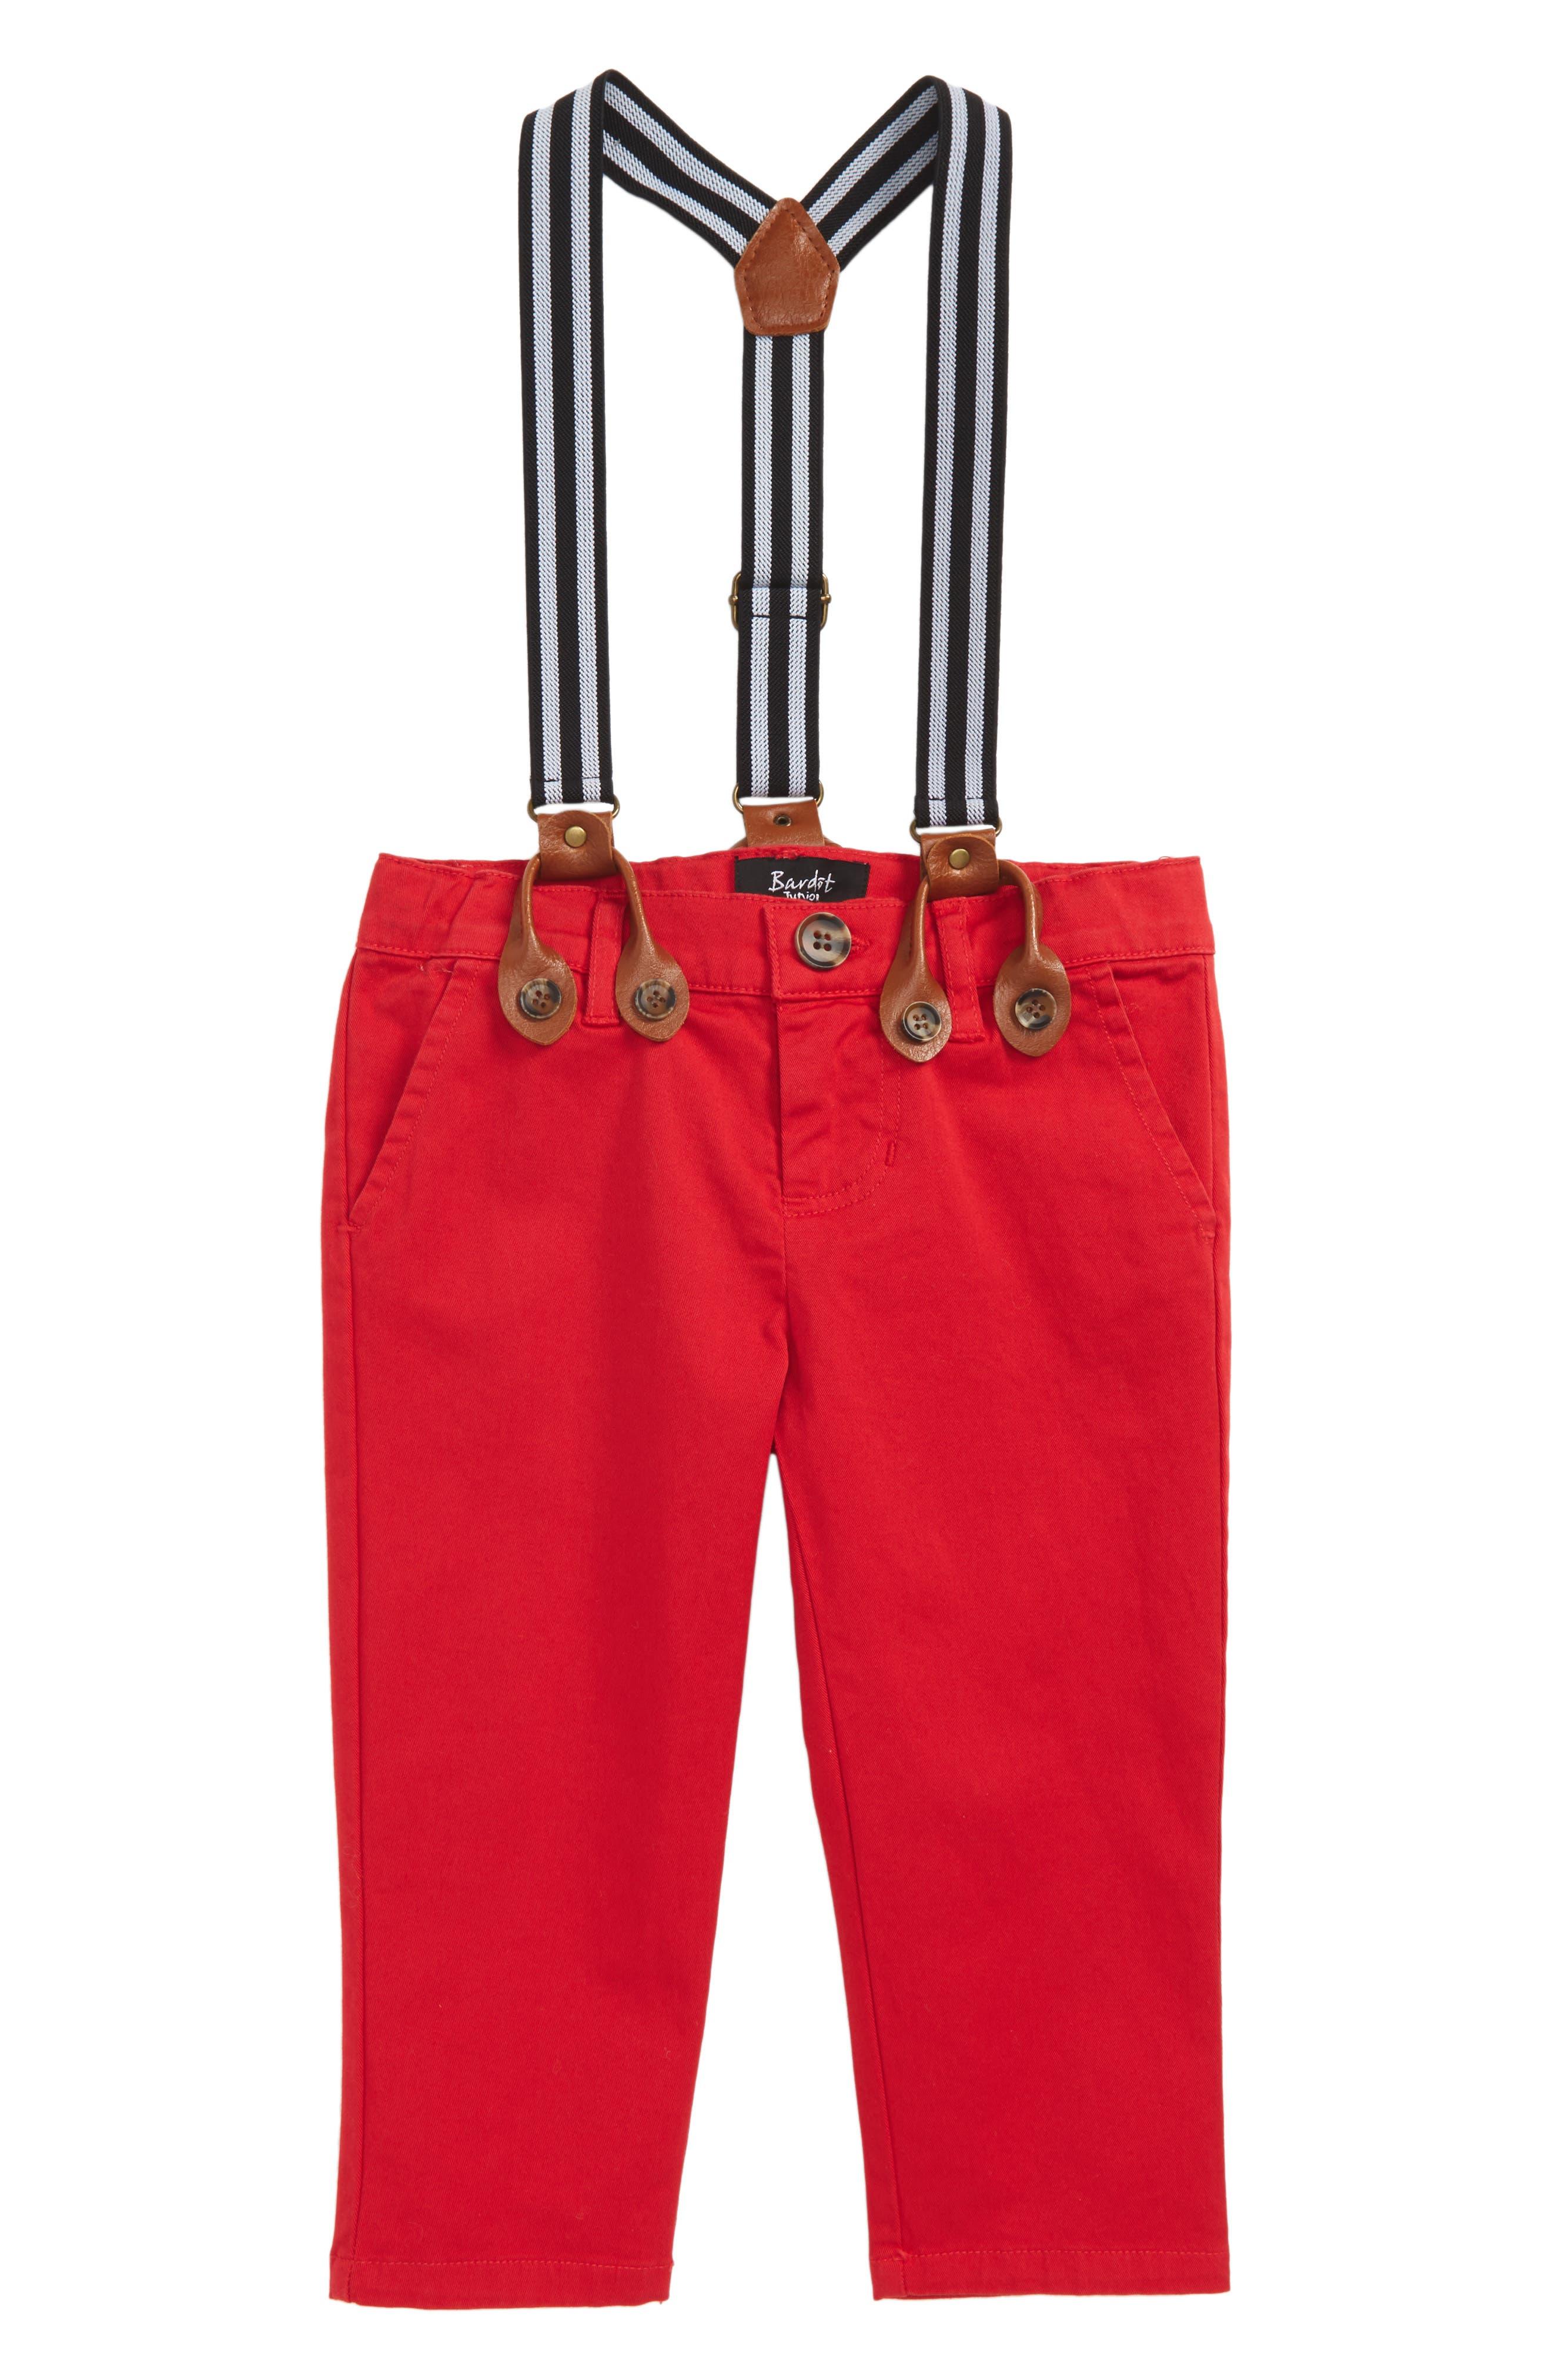 Chinos & Suspenders Set,                         Main,                         color, 620